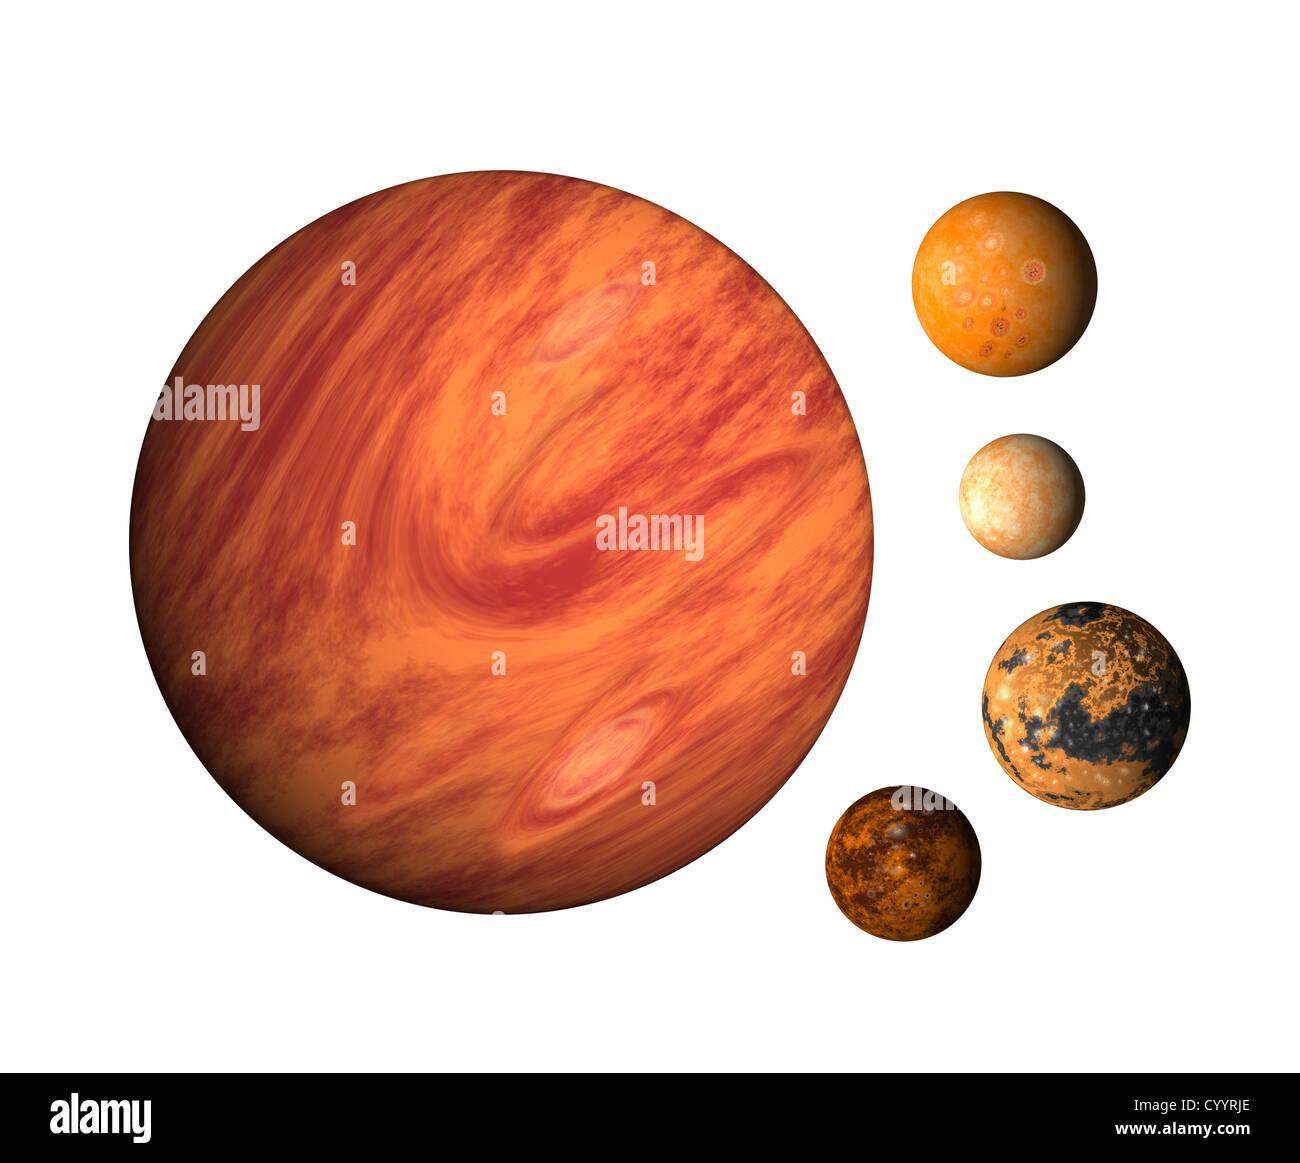 illustration of planet Jupiter with moons europa, callisto,ganymede,io on isolated background - Stock Image